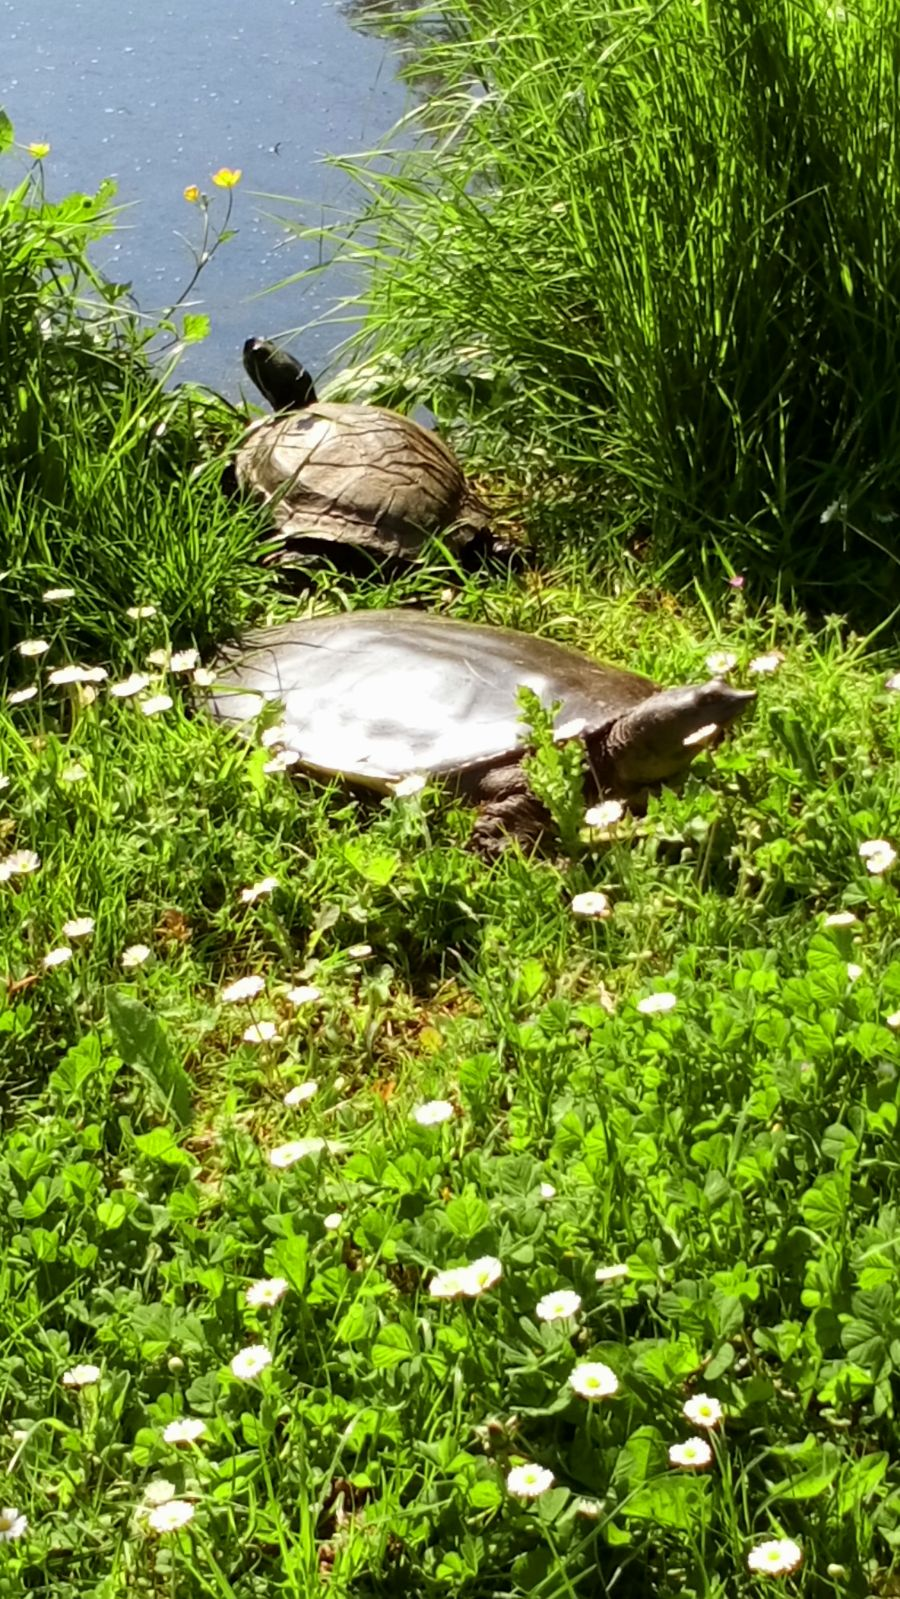 Turtle and terrapin sunbathing